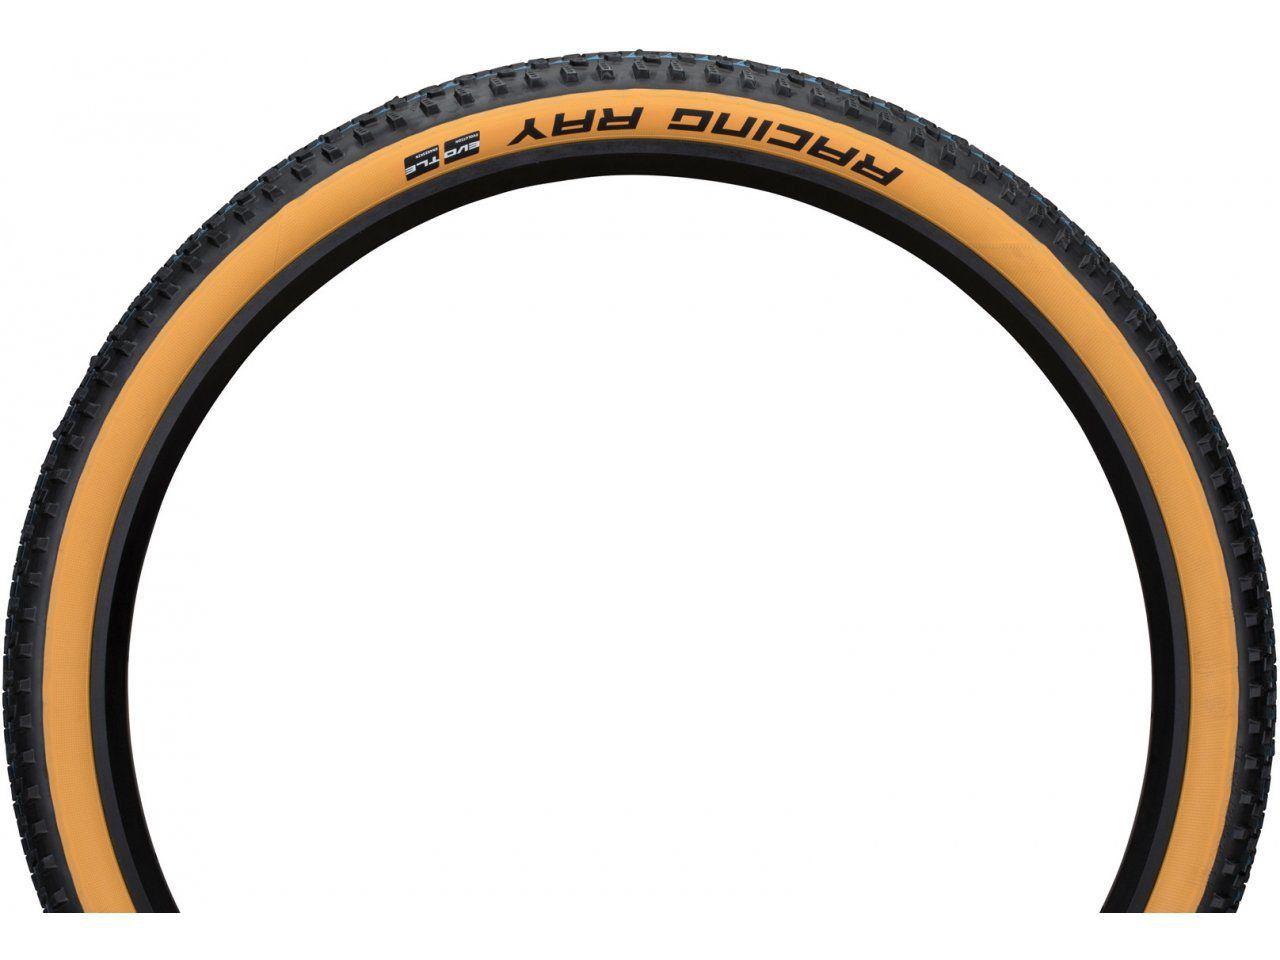 Pneu de Bicicleta Schwalbe Racing Ray Evolution Addix 29 x 2.25